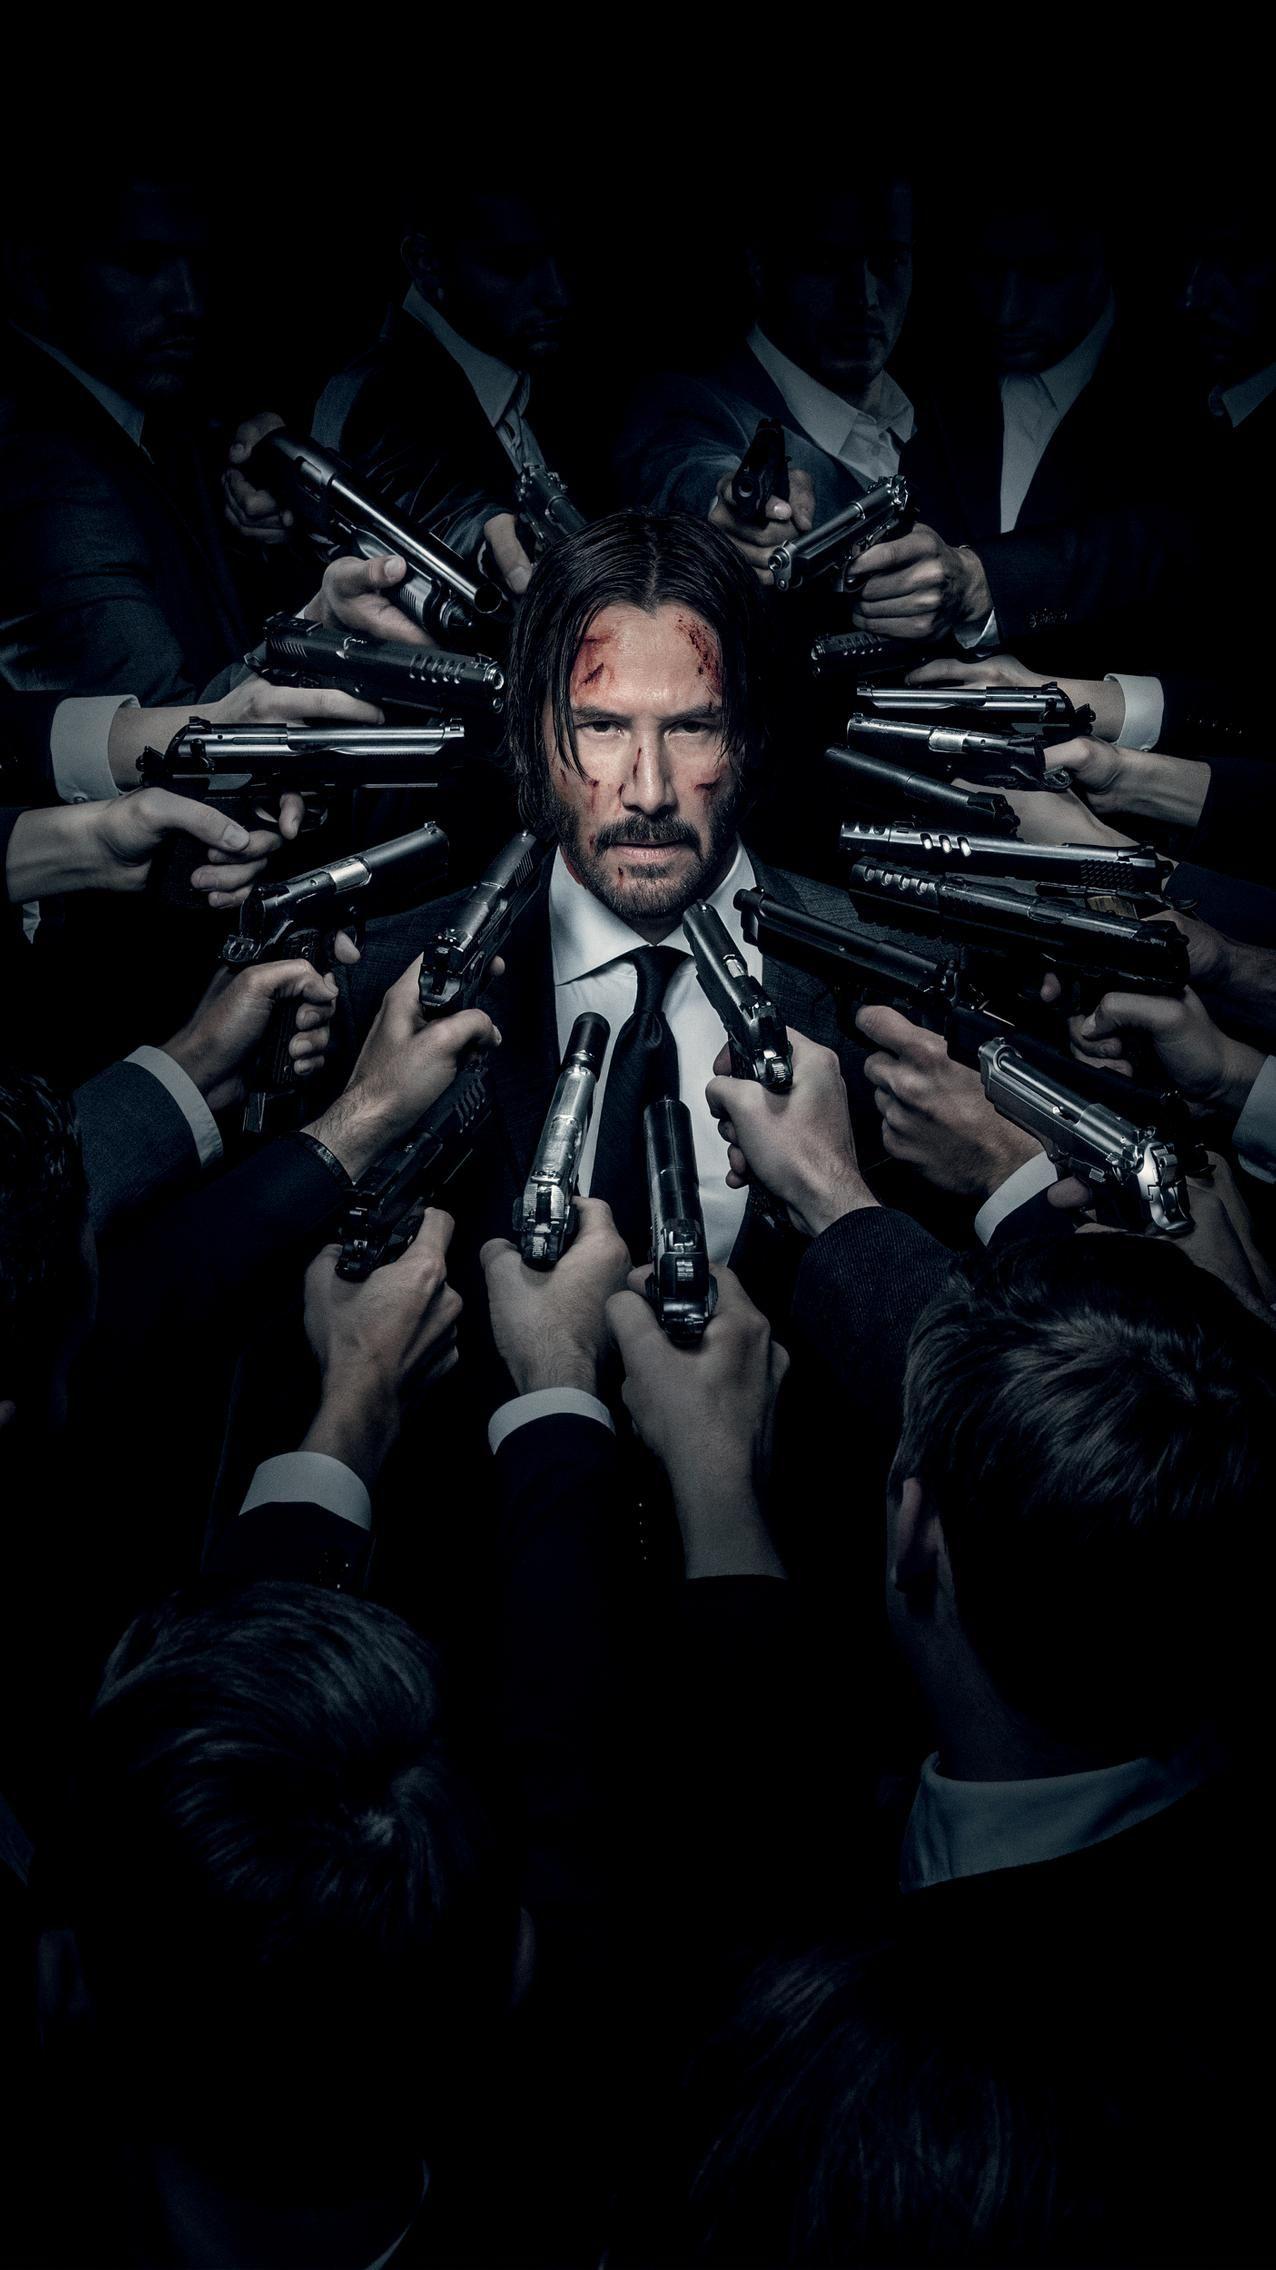 John Wick Chapter 2 2017 Phone Wallpaper Moviemania John Wick Hd John Wick Movie Keanu Reeves John Wick